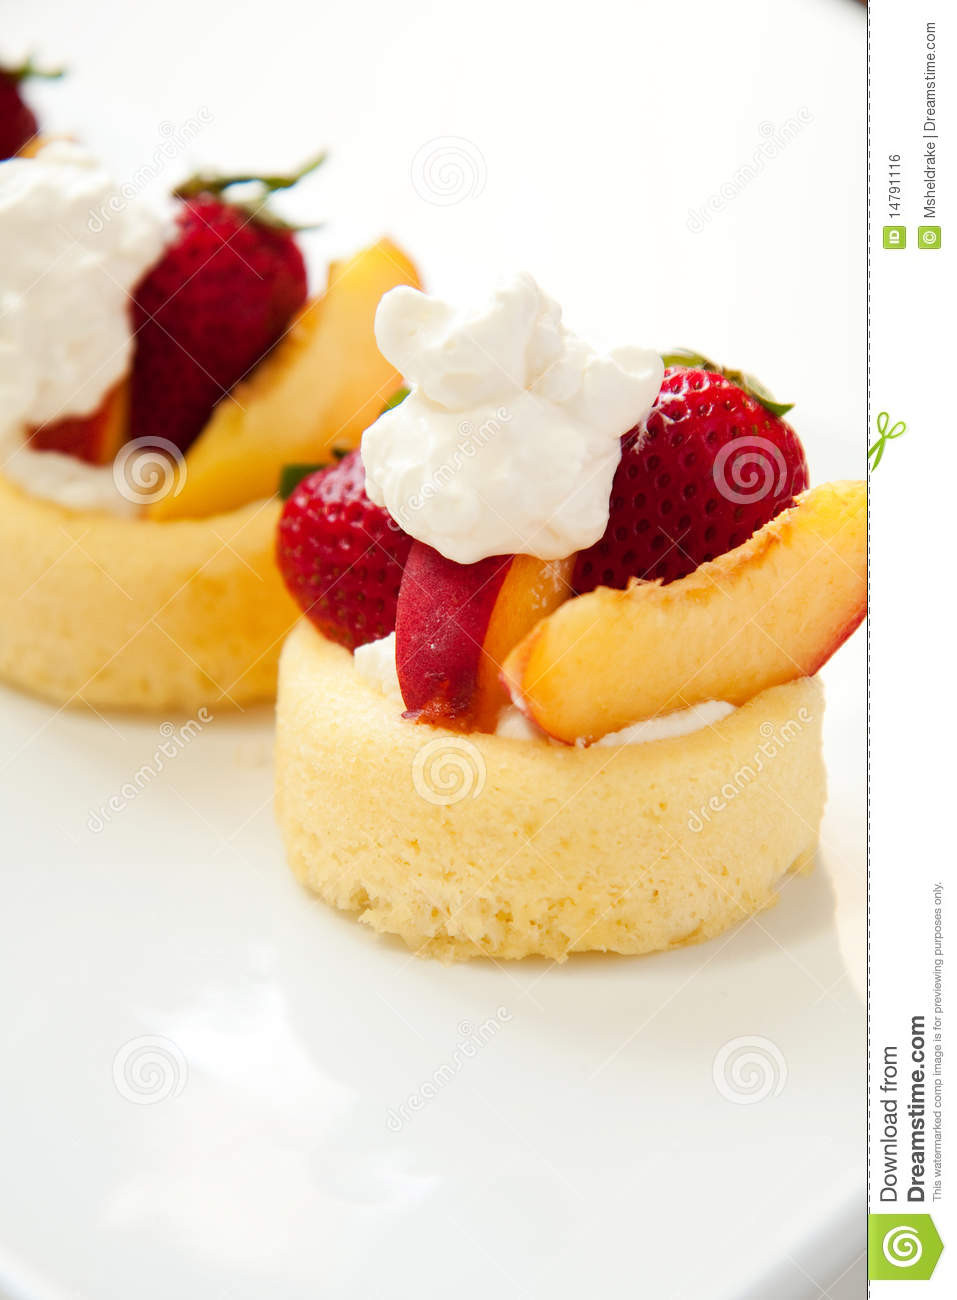 Easy Summer Fruit Desserts  Simple Summer Fruit Dessert Royalty Free Stock Image